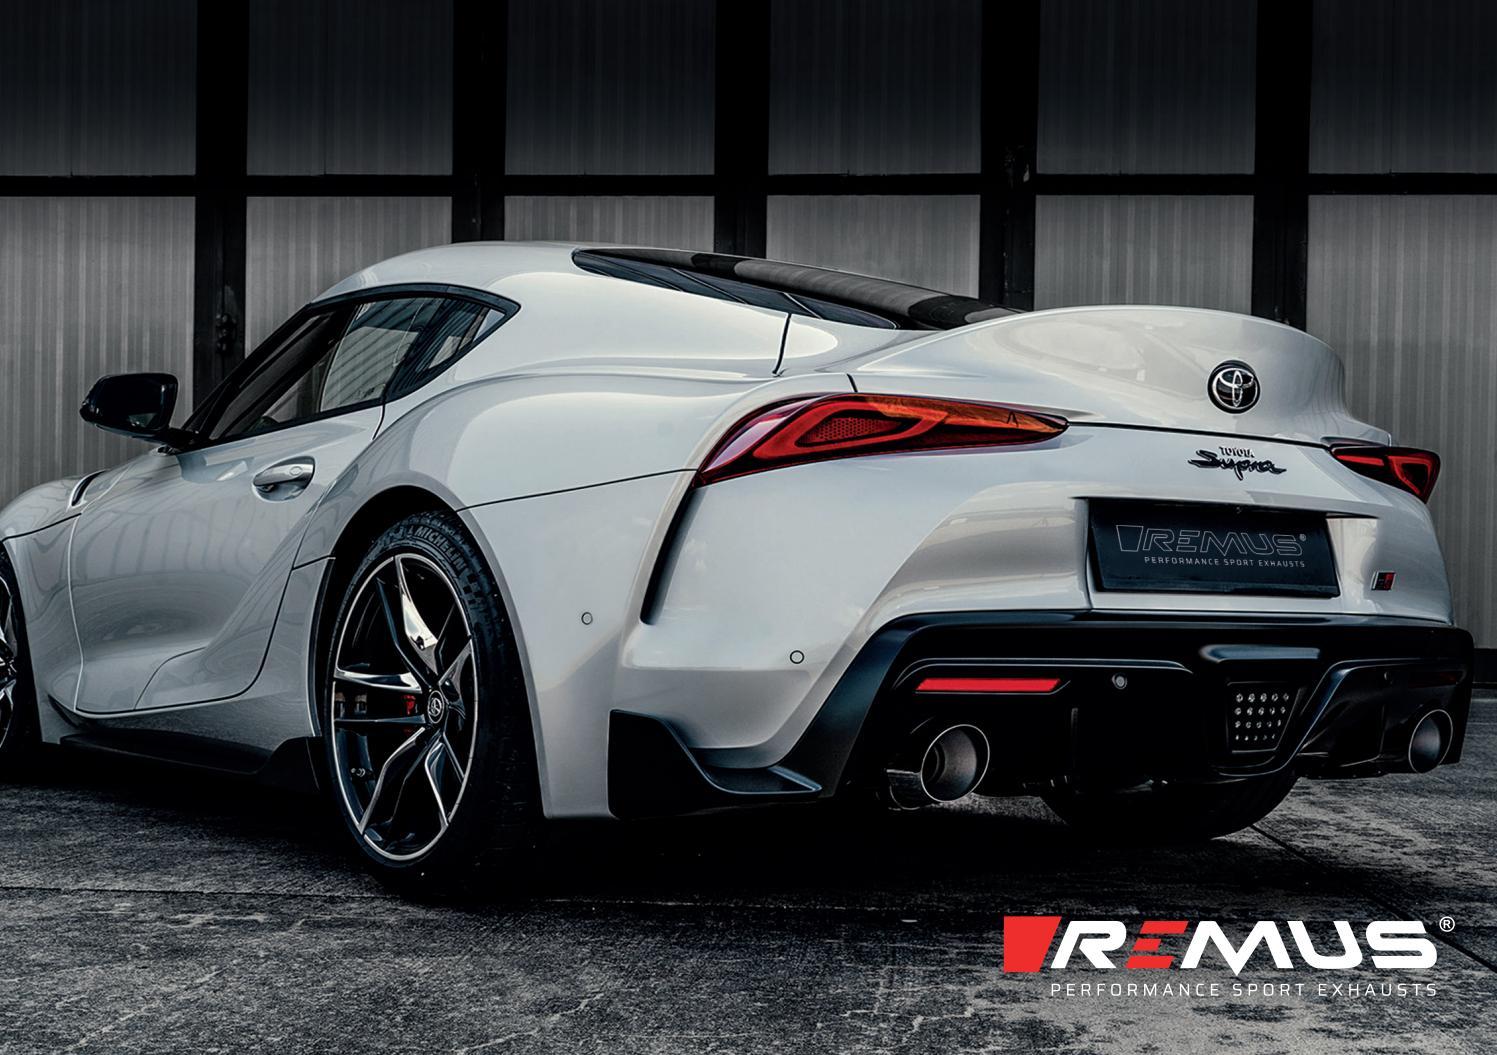 remus automotive brochure 2019 by remus